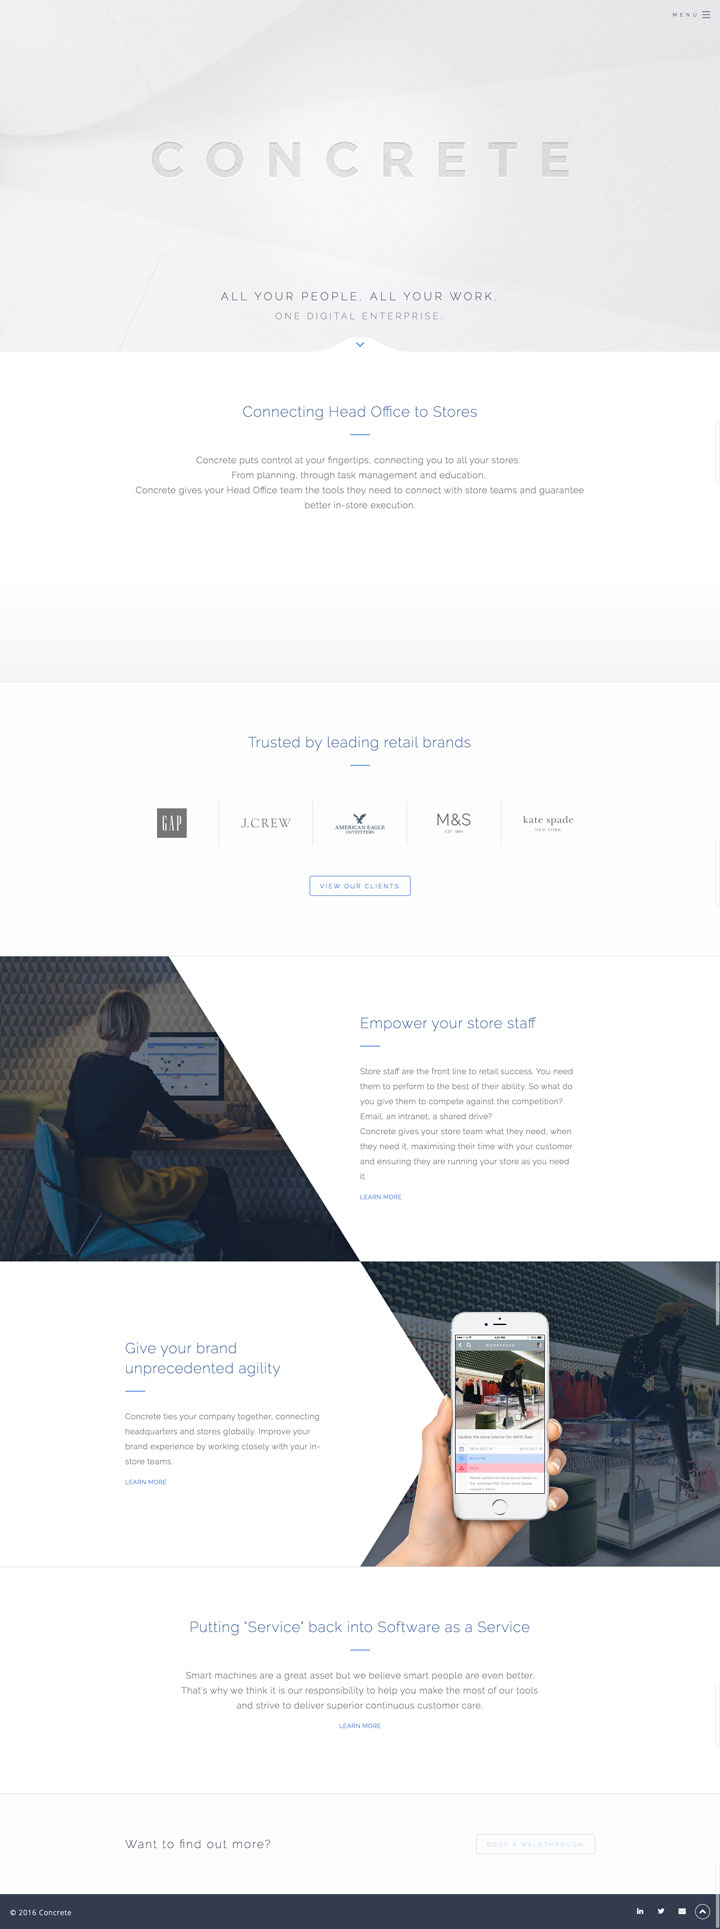 Concrete Platform's retail software website